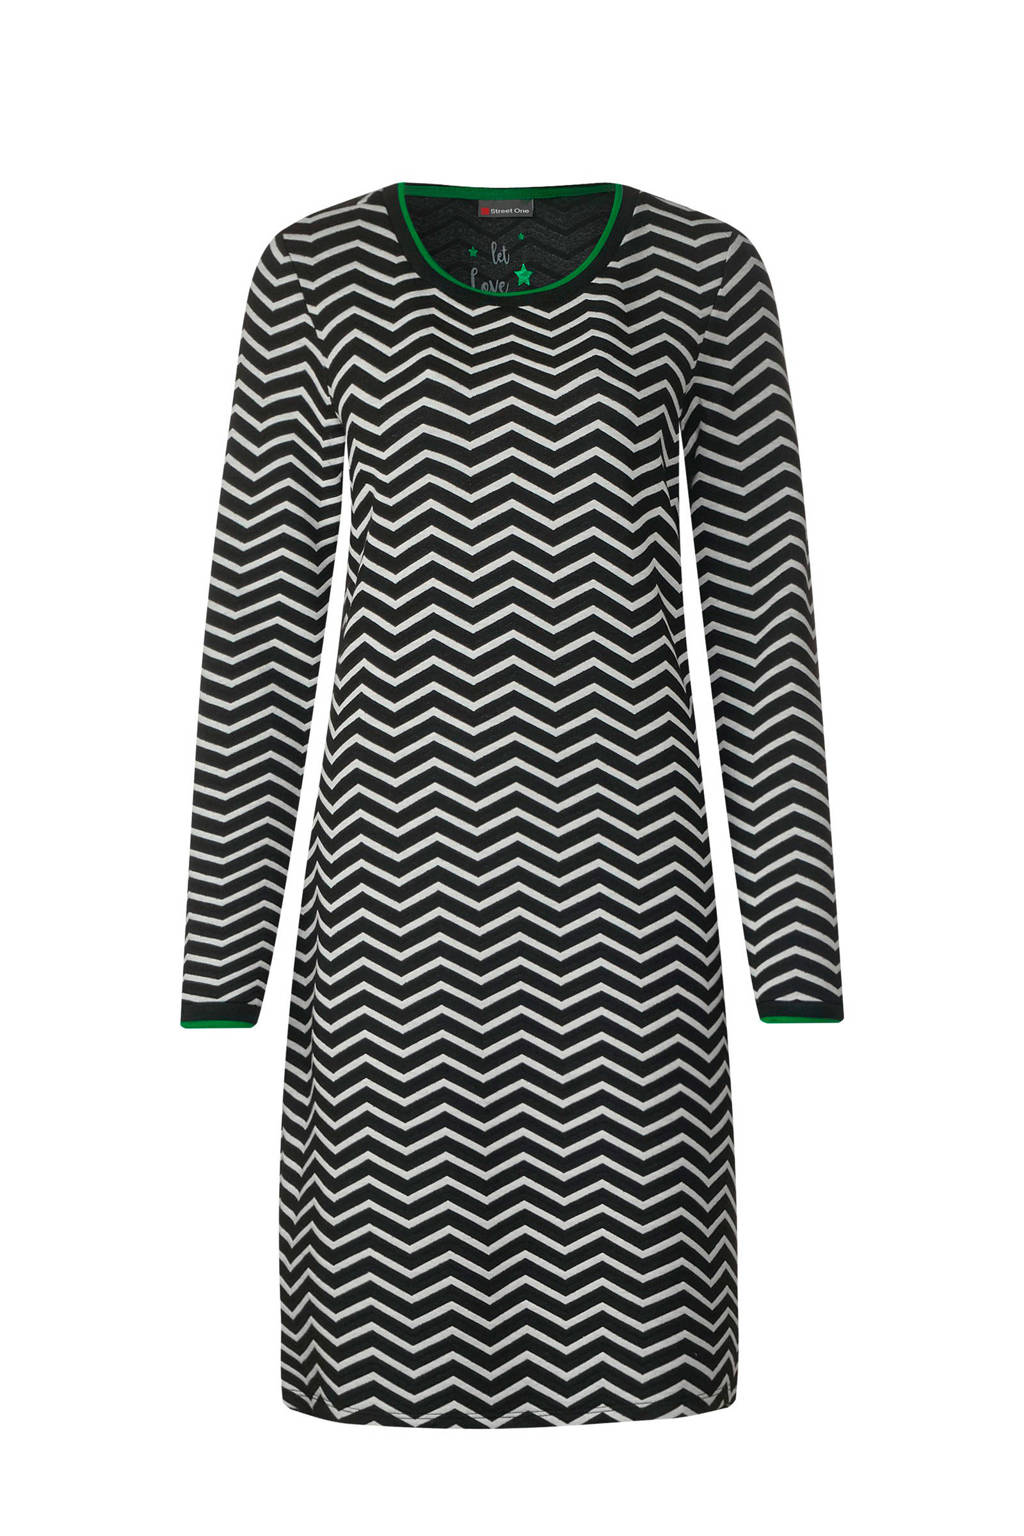 Street One jurk met all over print, Zwart/wit/groen